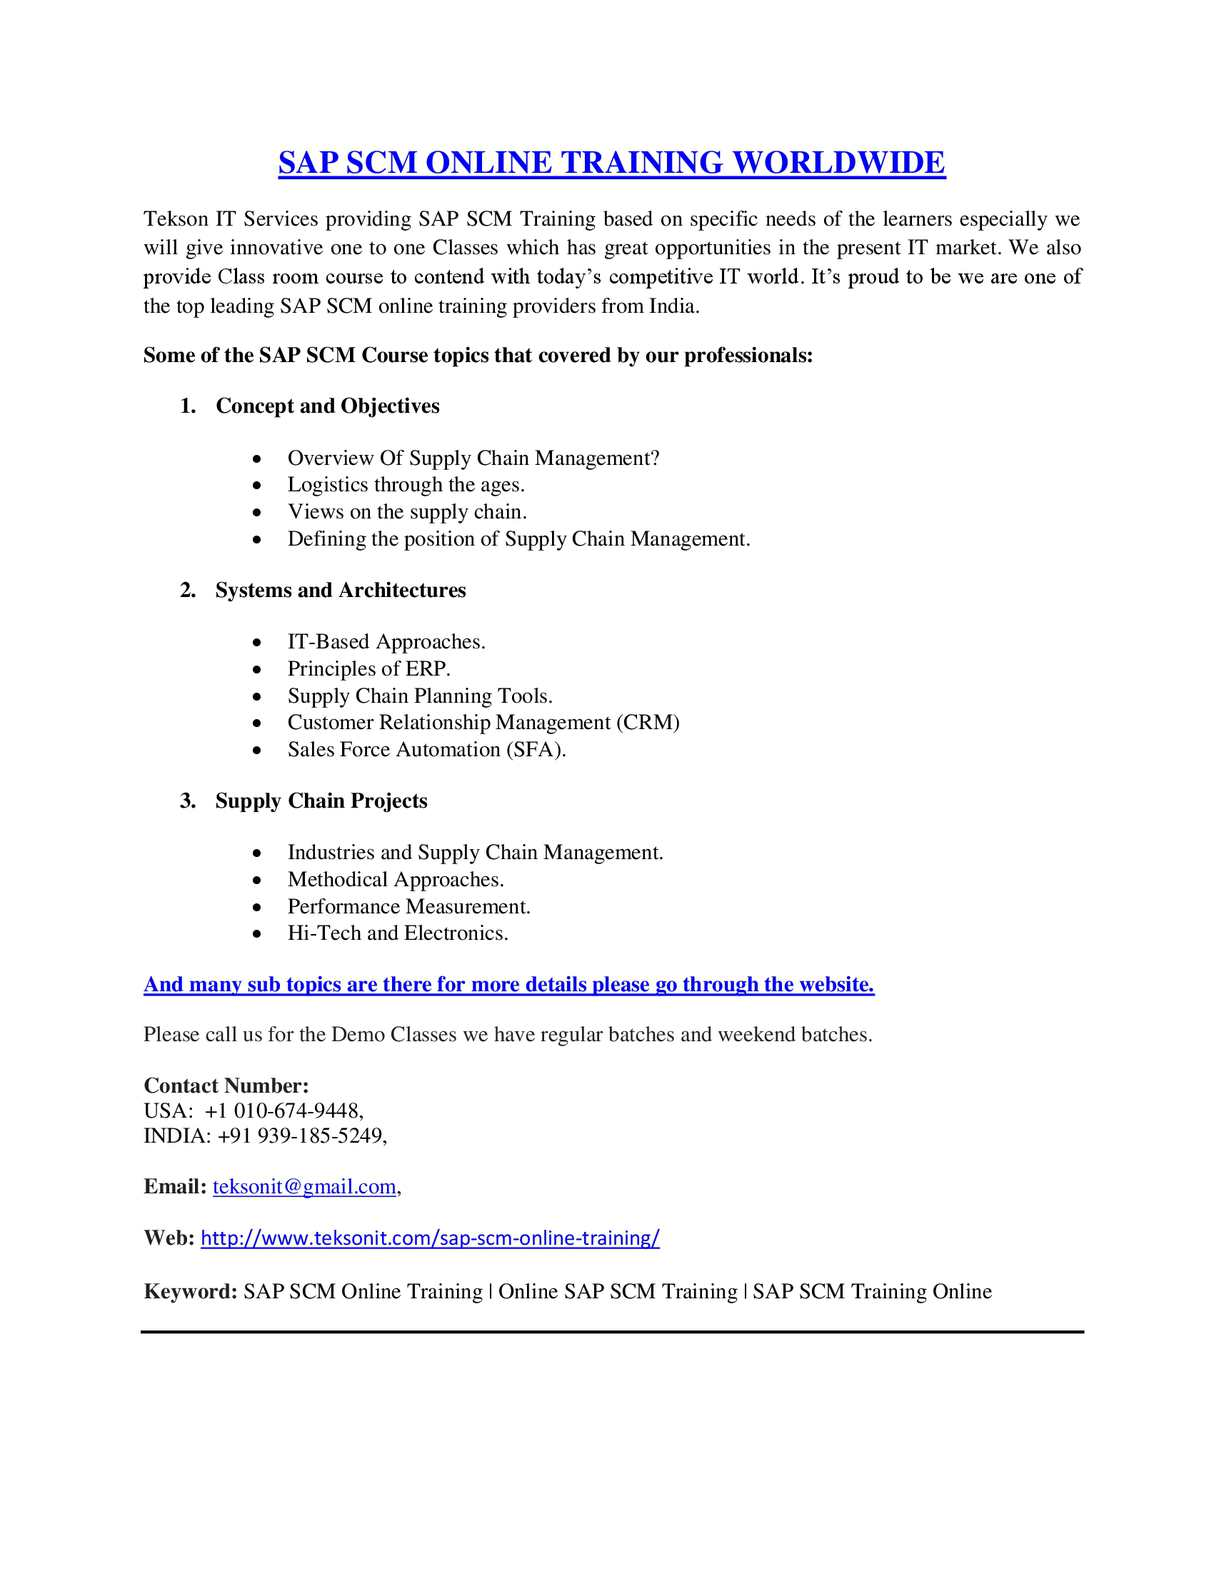 Calaméo - SAP SCM Online Training | Online SAP SCM Training Worldwide